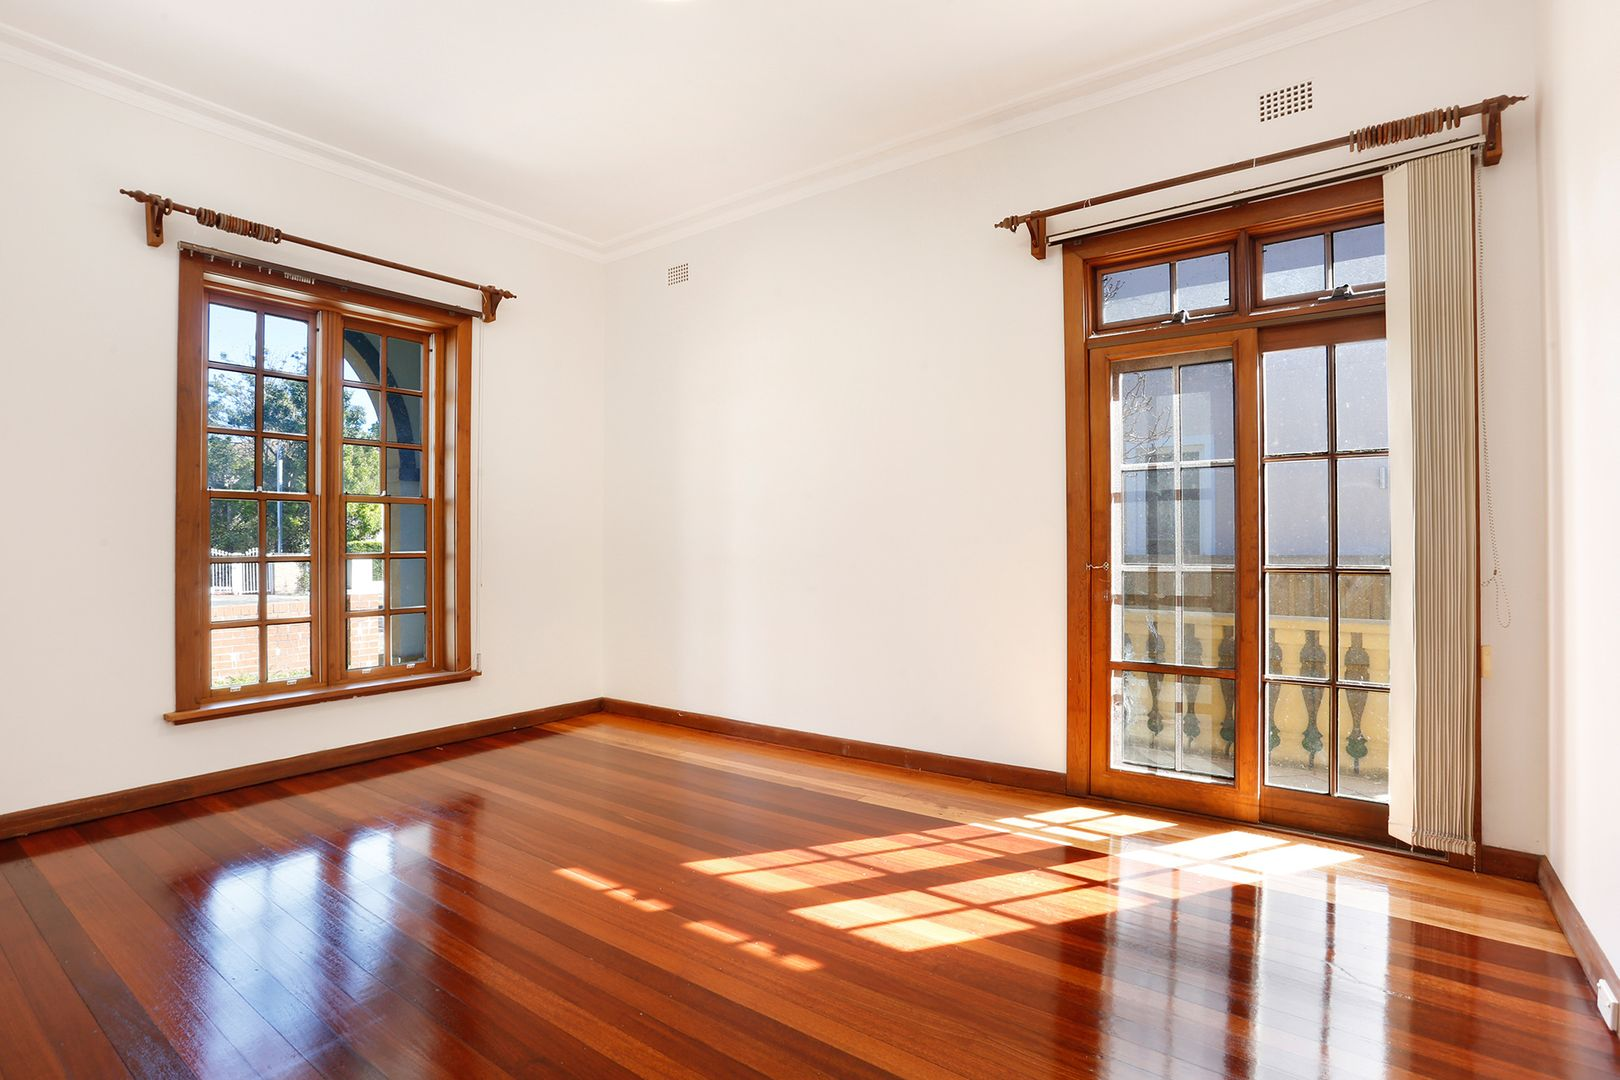 9 Chatswood Avenue, Chatswood NSW 2067, Image 1